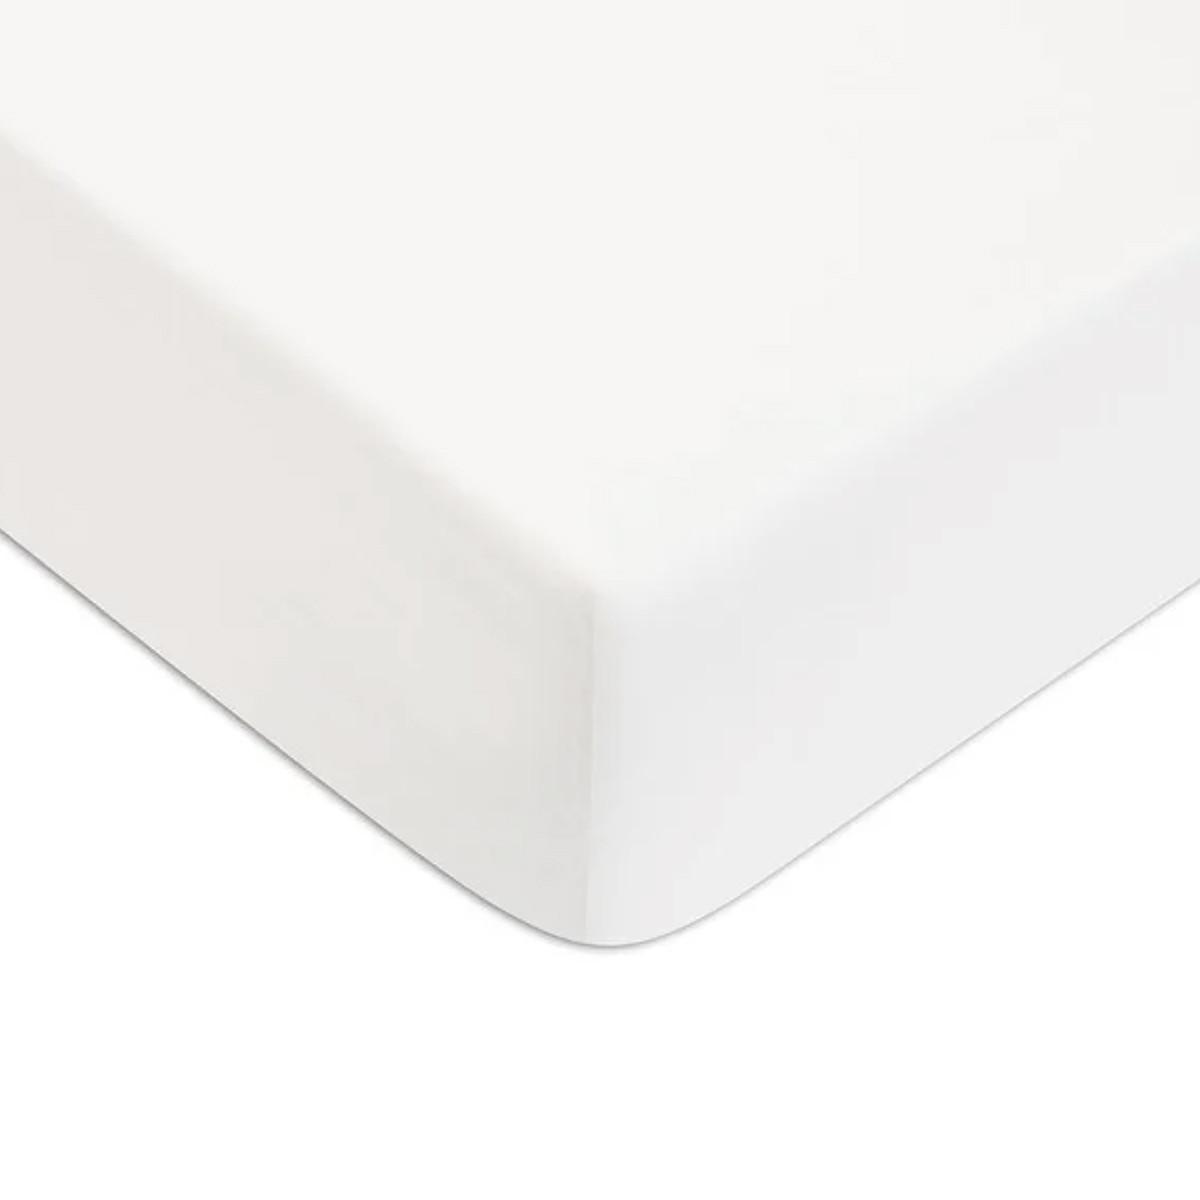 Drap housse Blanc 160x200cm 57 fils